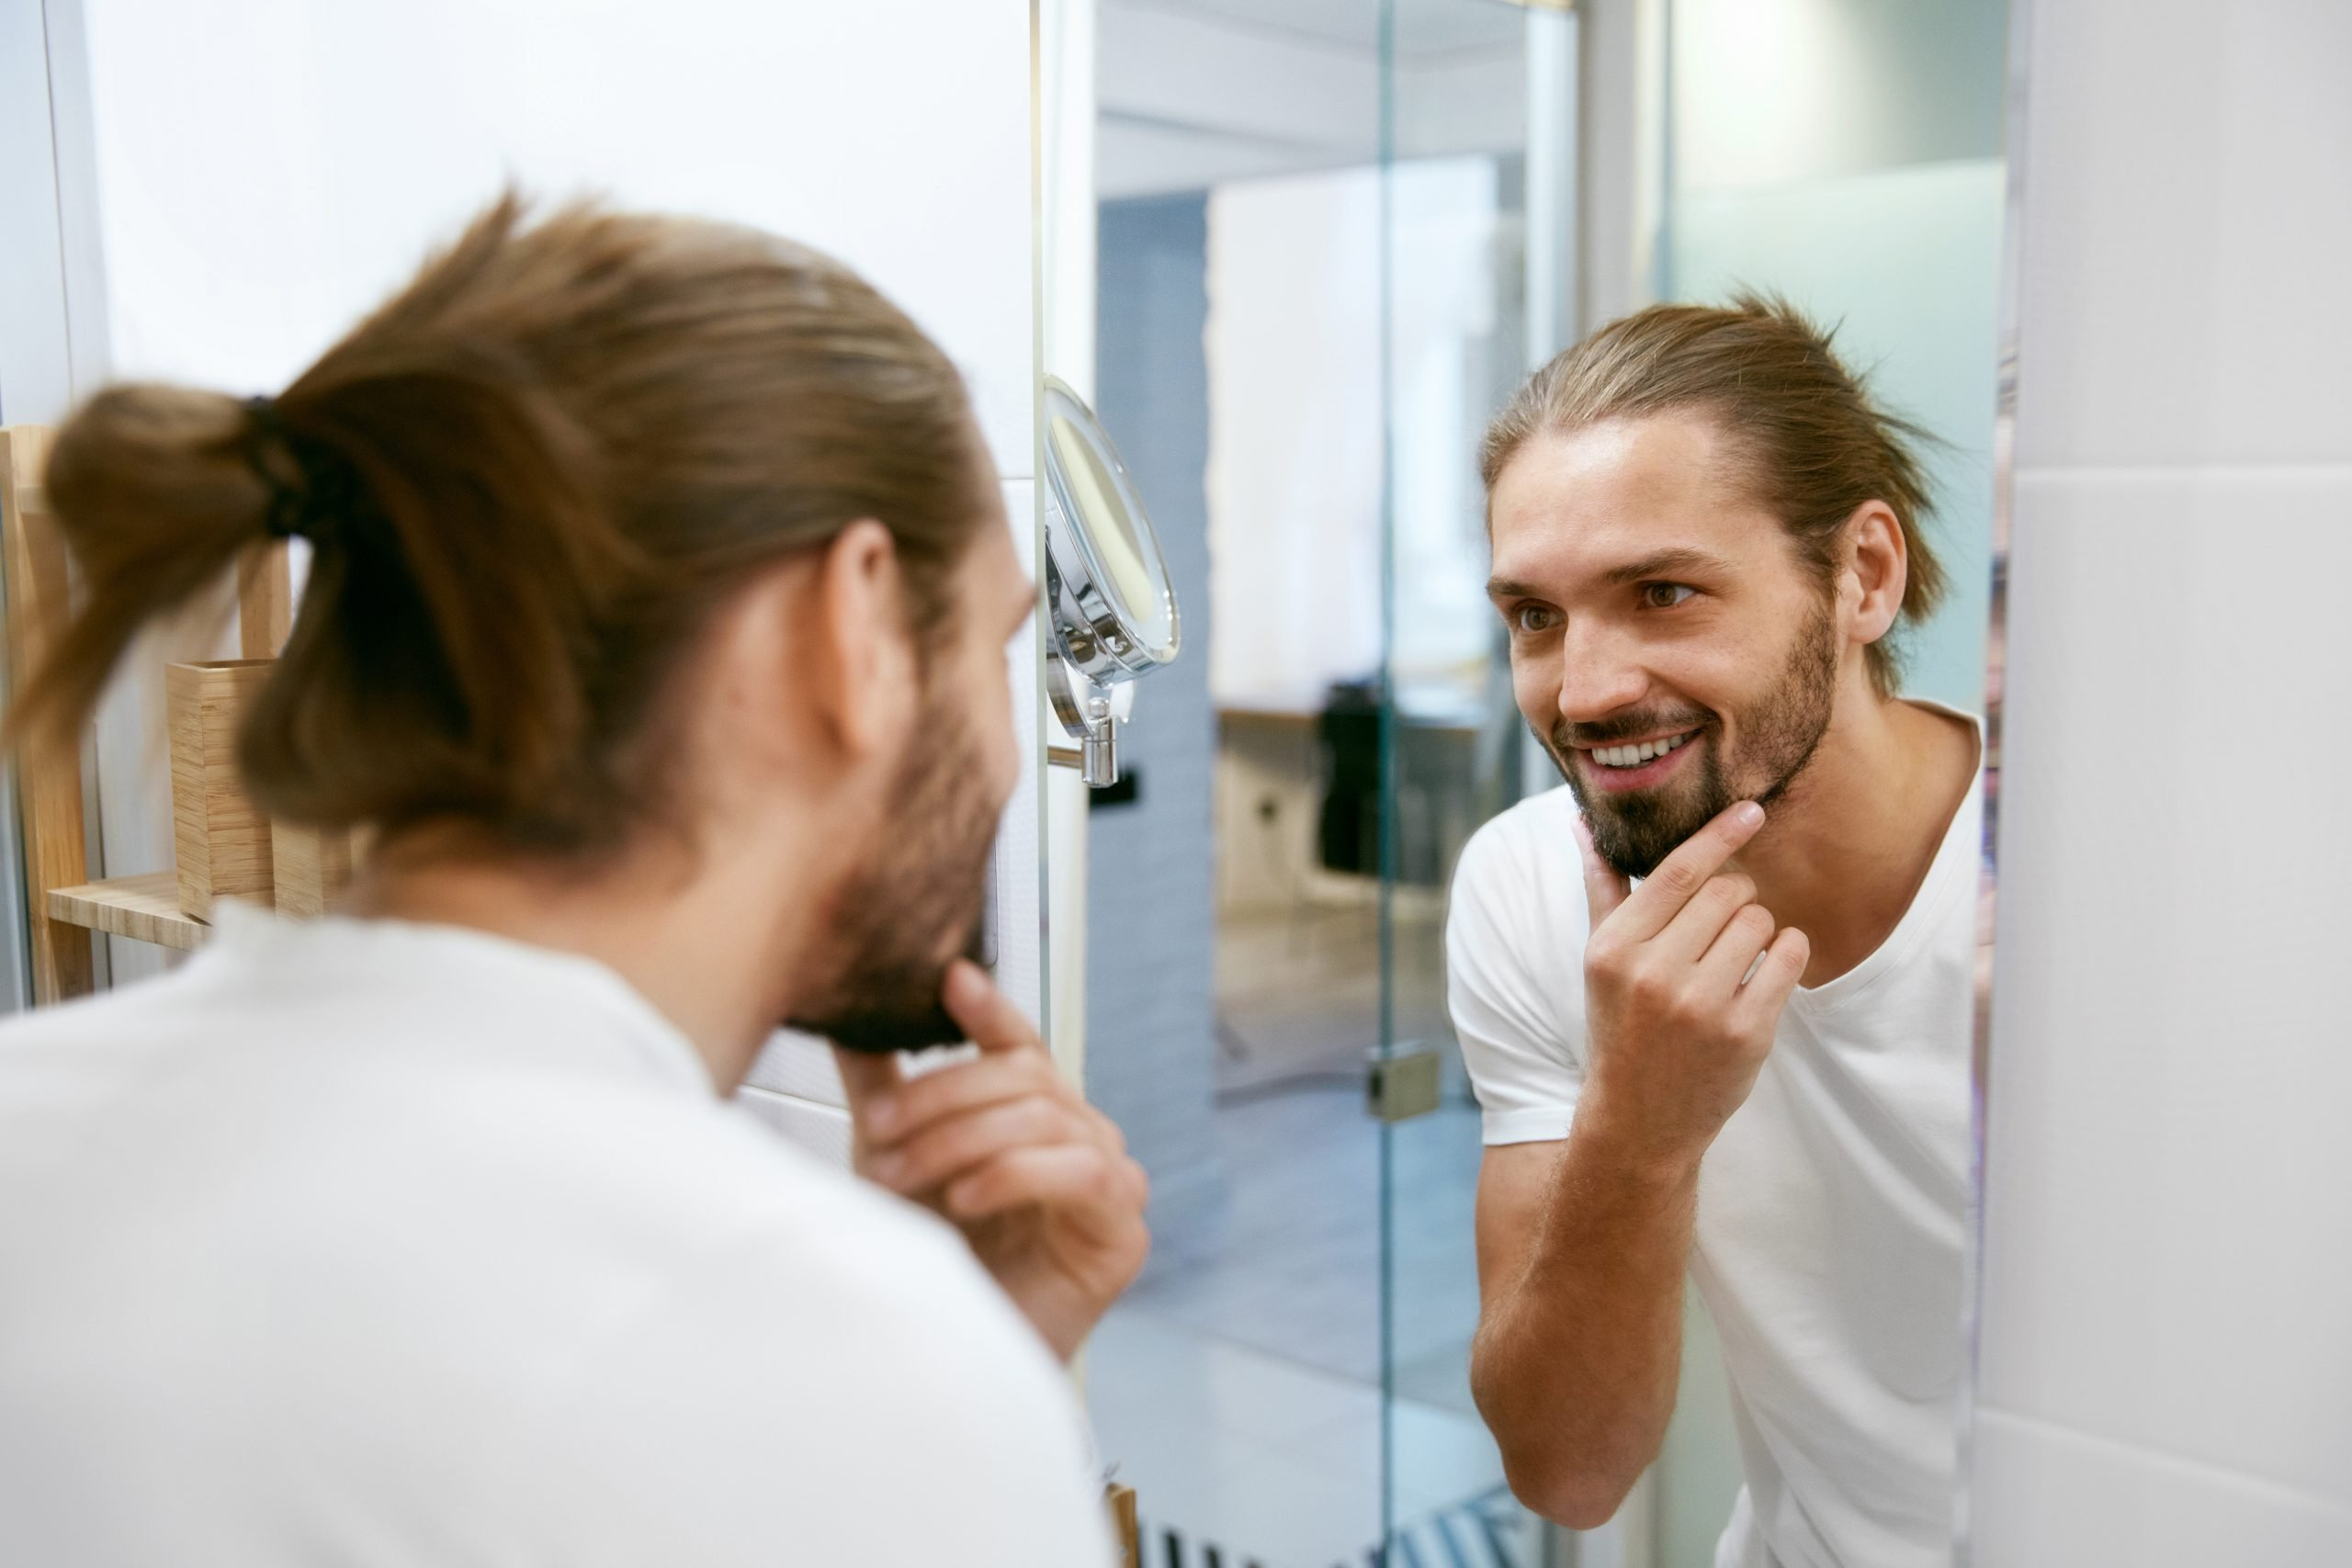 Facial Reconstruction Can Help You Rebuild Your Confidence PRECiDENT